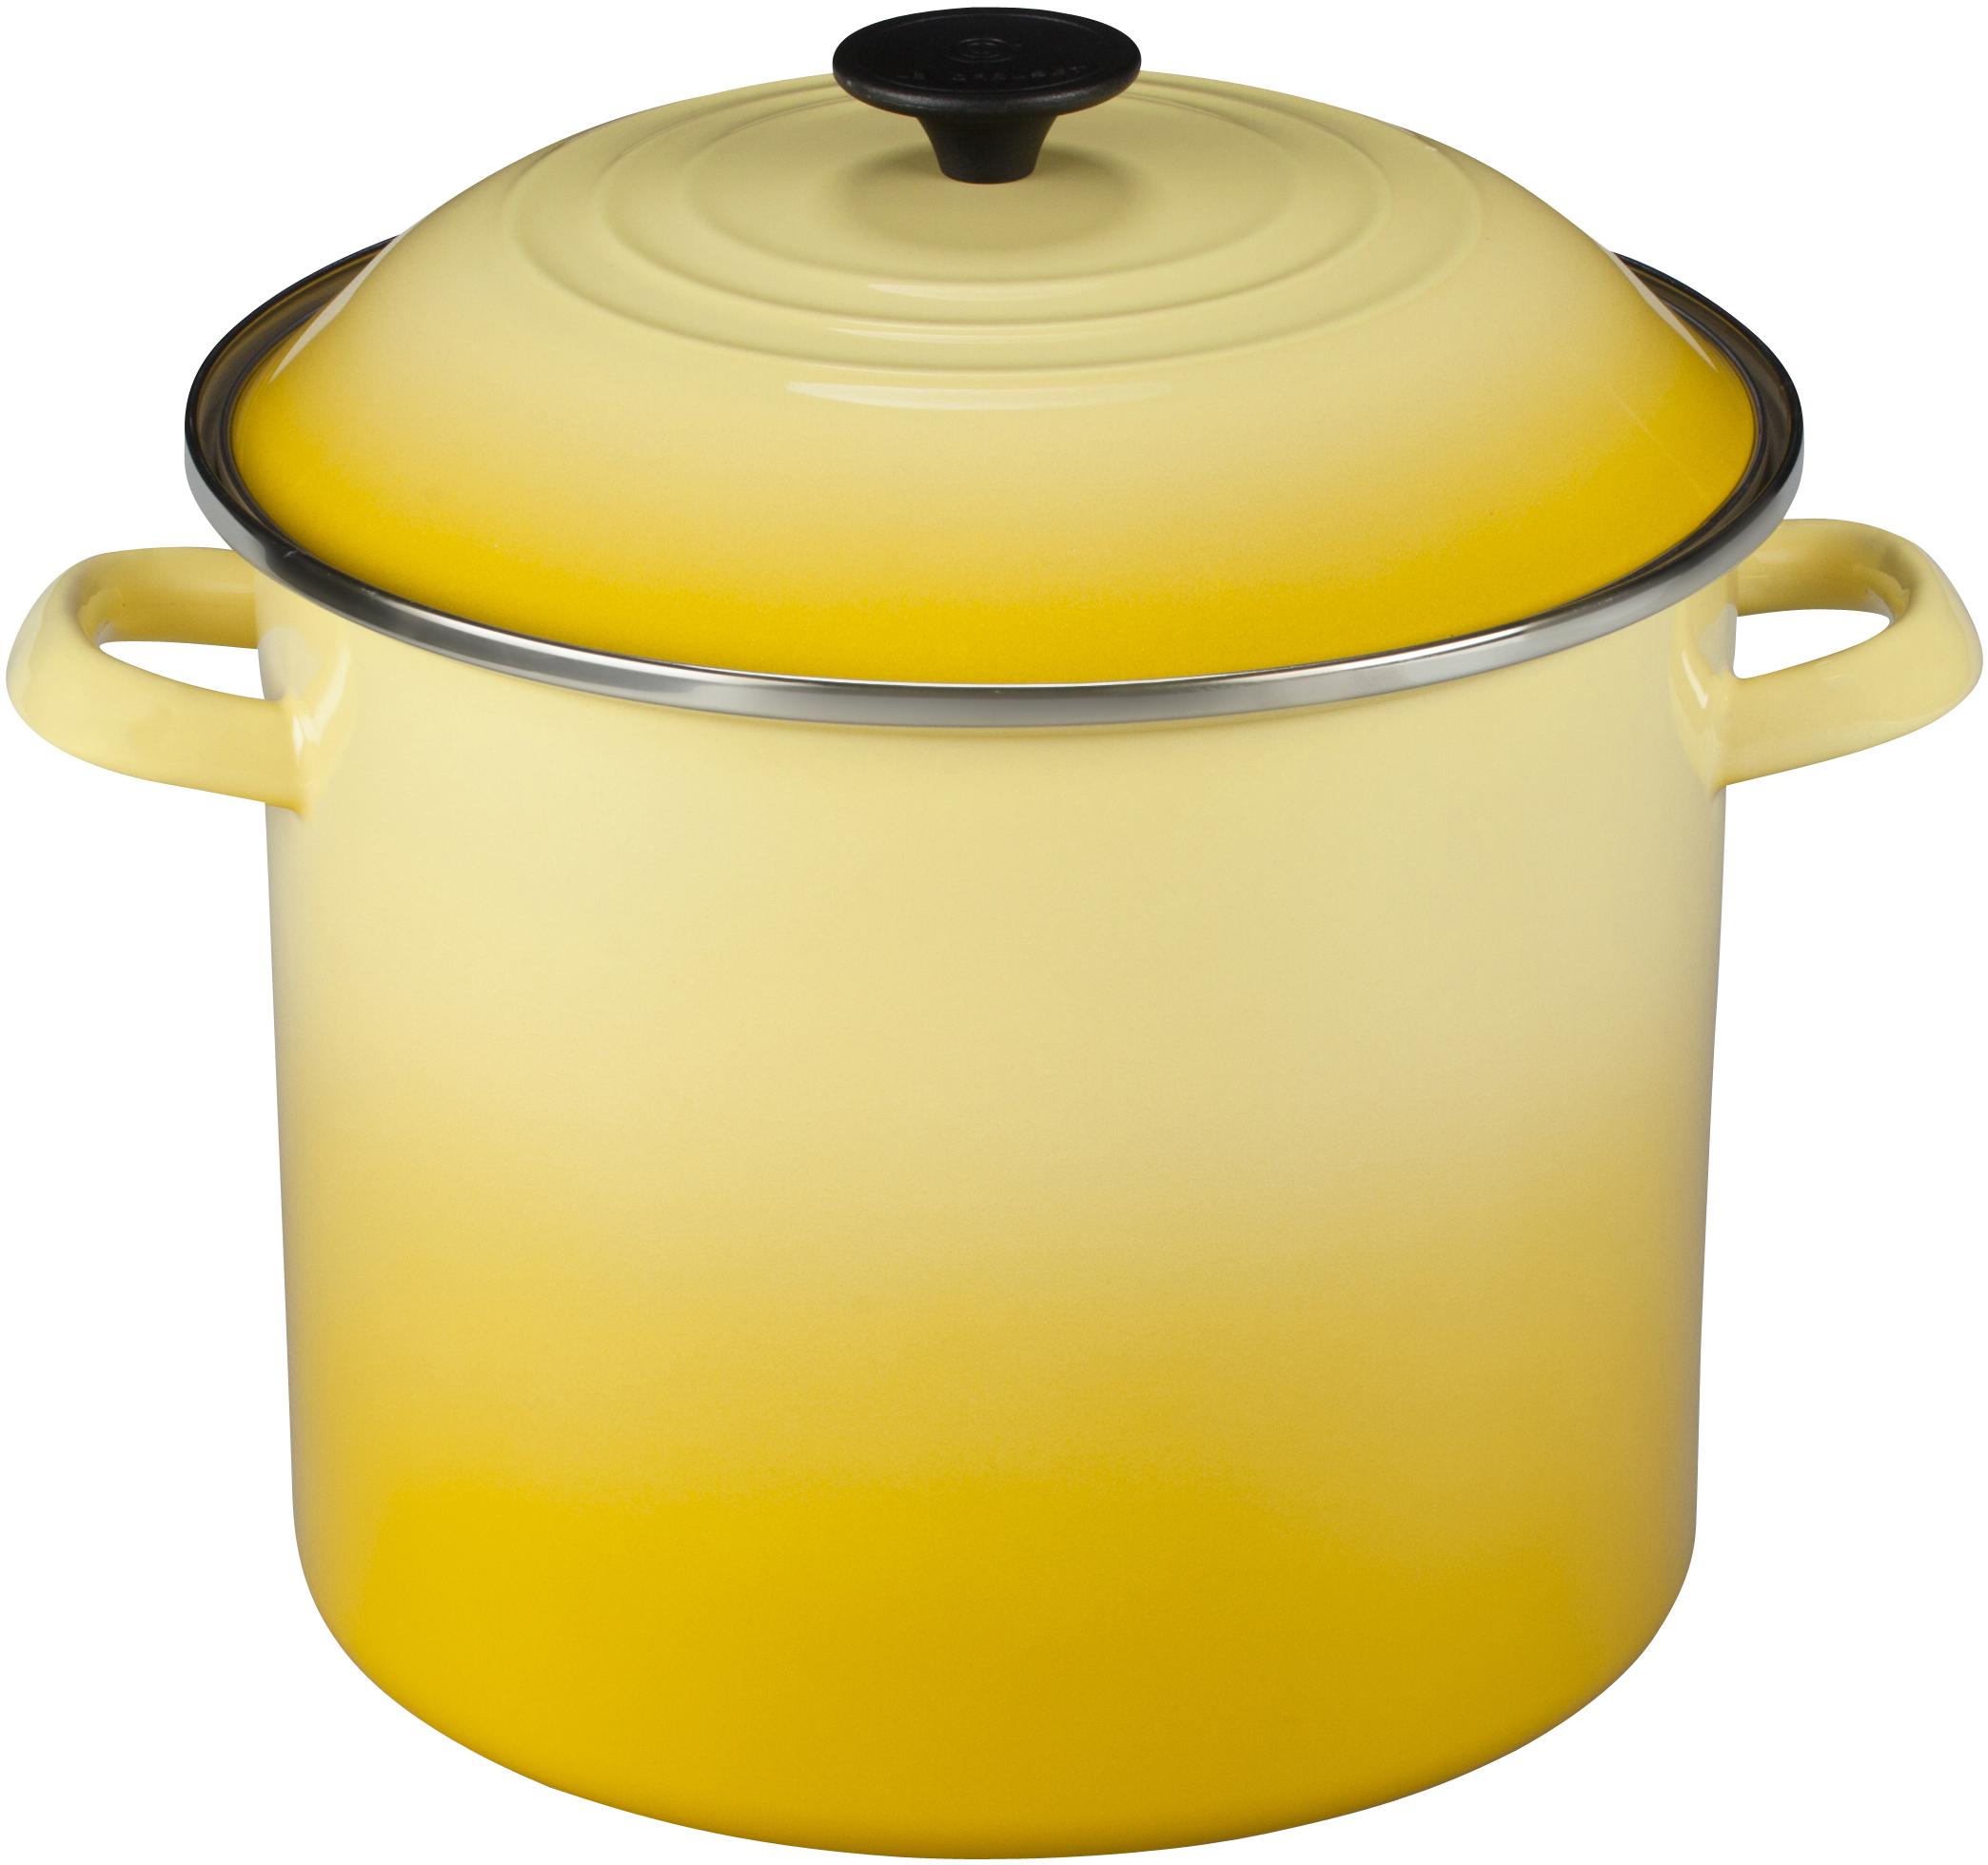 Le Creuset Soleil Yellow Enamel on Steel Stockpot, 20 Quart